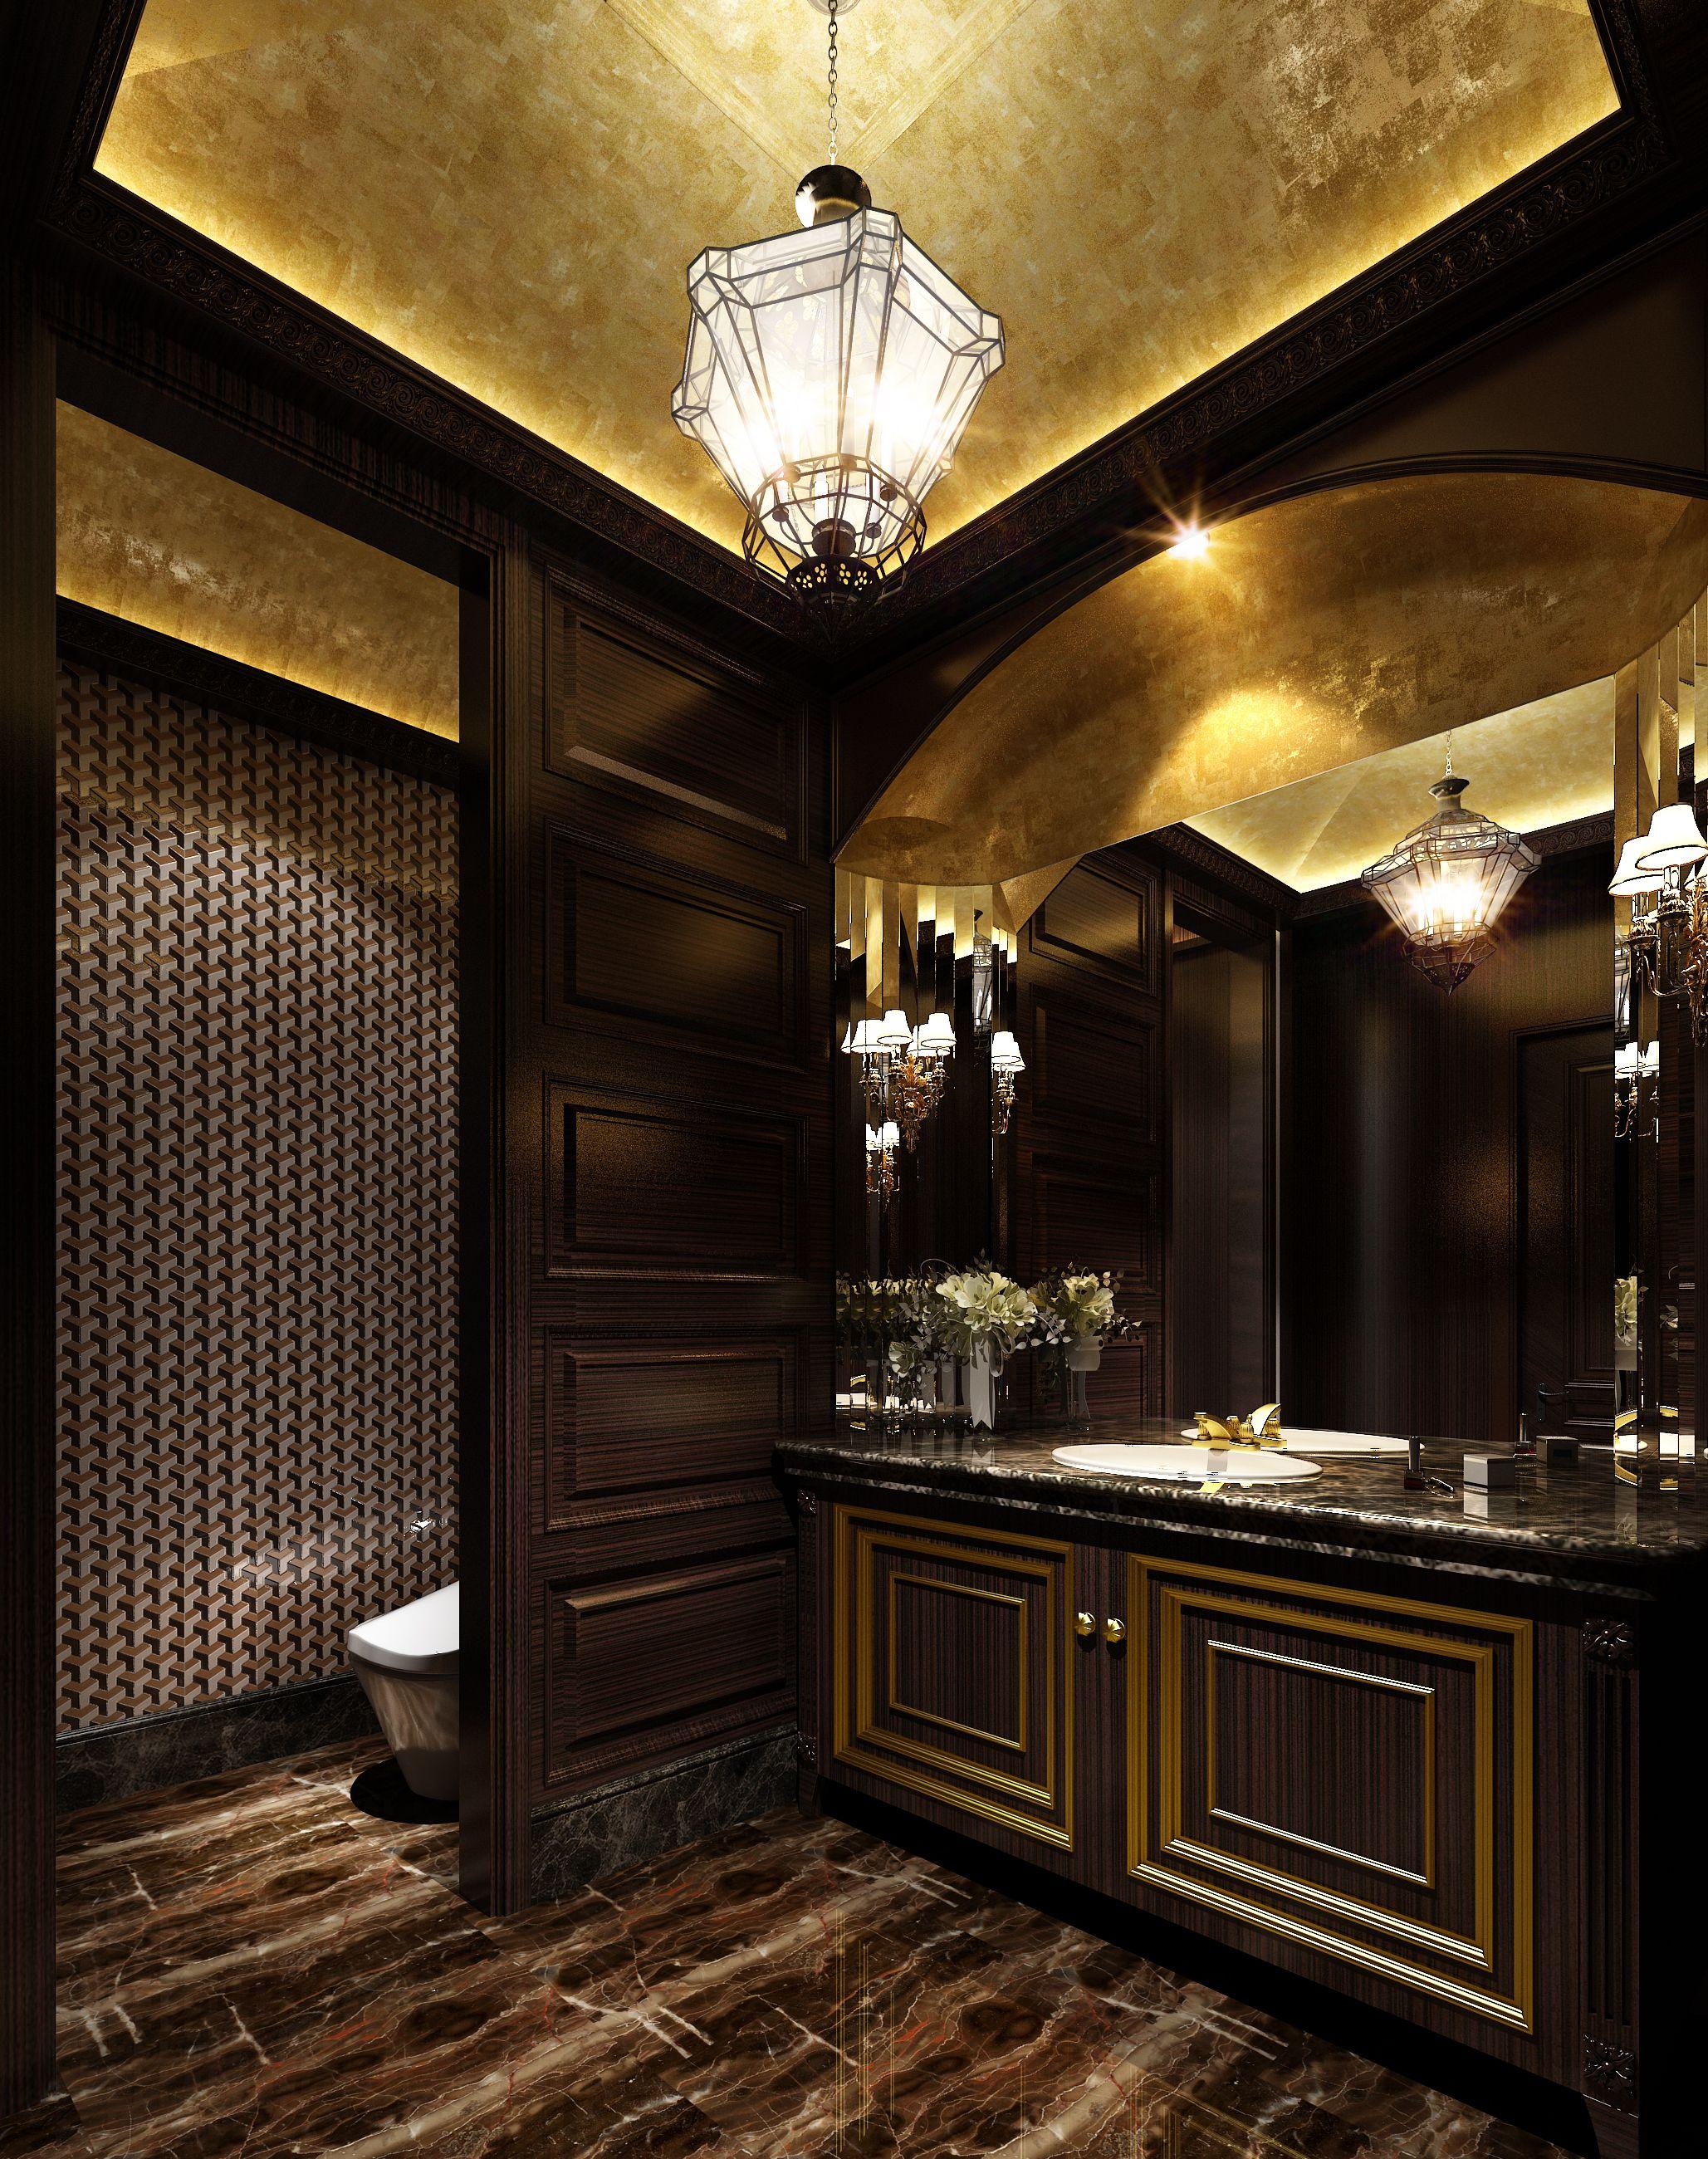 Dark Marble Floors Luxurious Dark Bathroom With Marble Floor 3d Model Marble Interior Bathroom Decor Luxury Dark Bathrooms